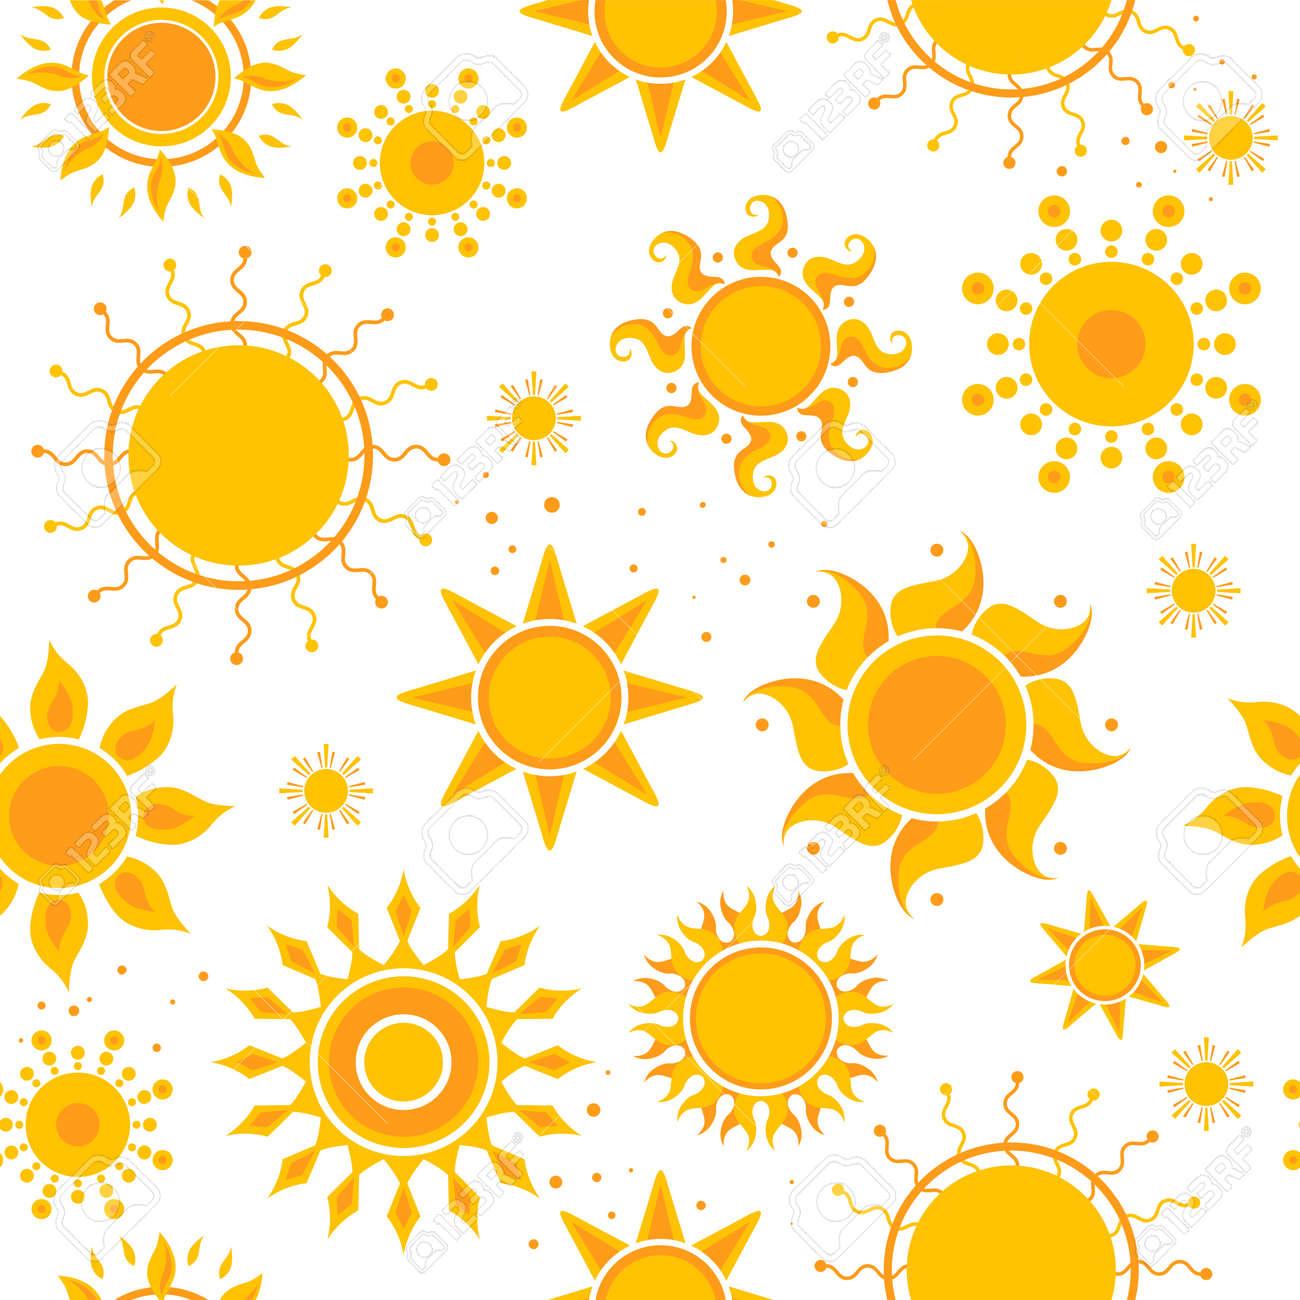 Sun seamless pictures. Weather summer sunshine pictures textile design vector hot pattern. Illustration of sun summer, orange warm pattern seamless - 168222063